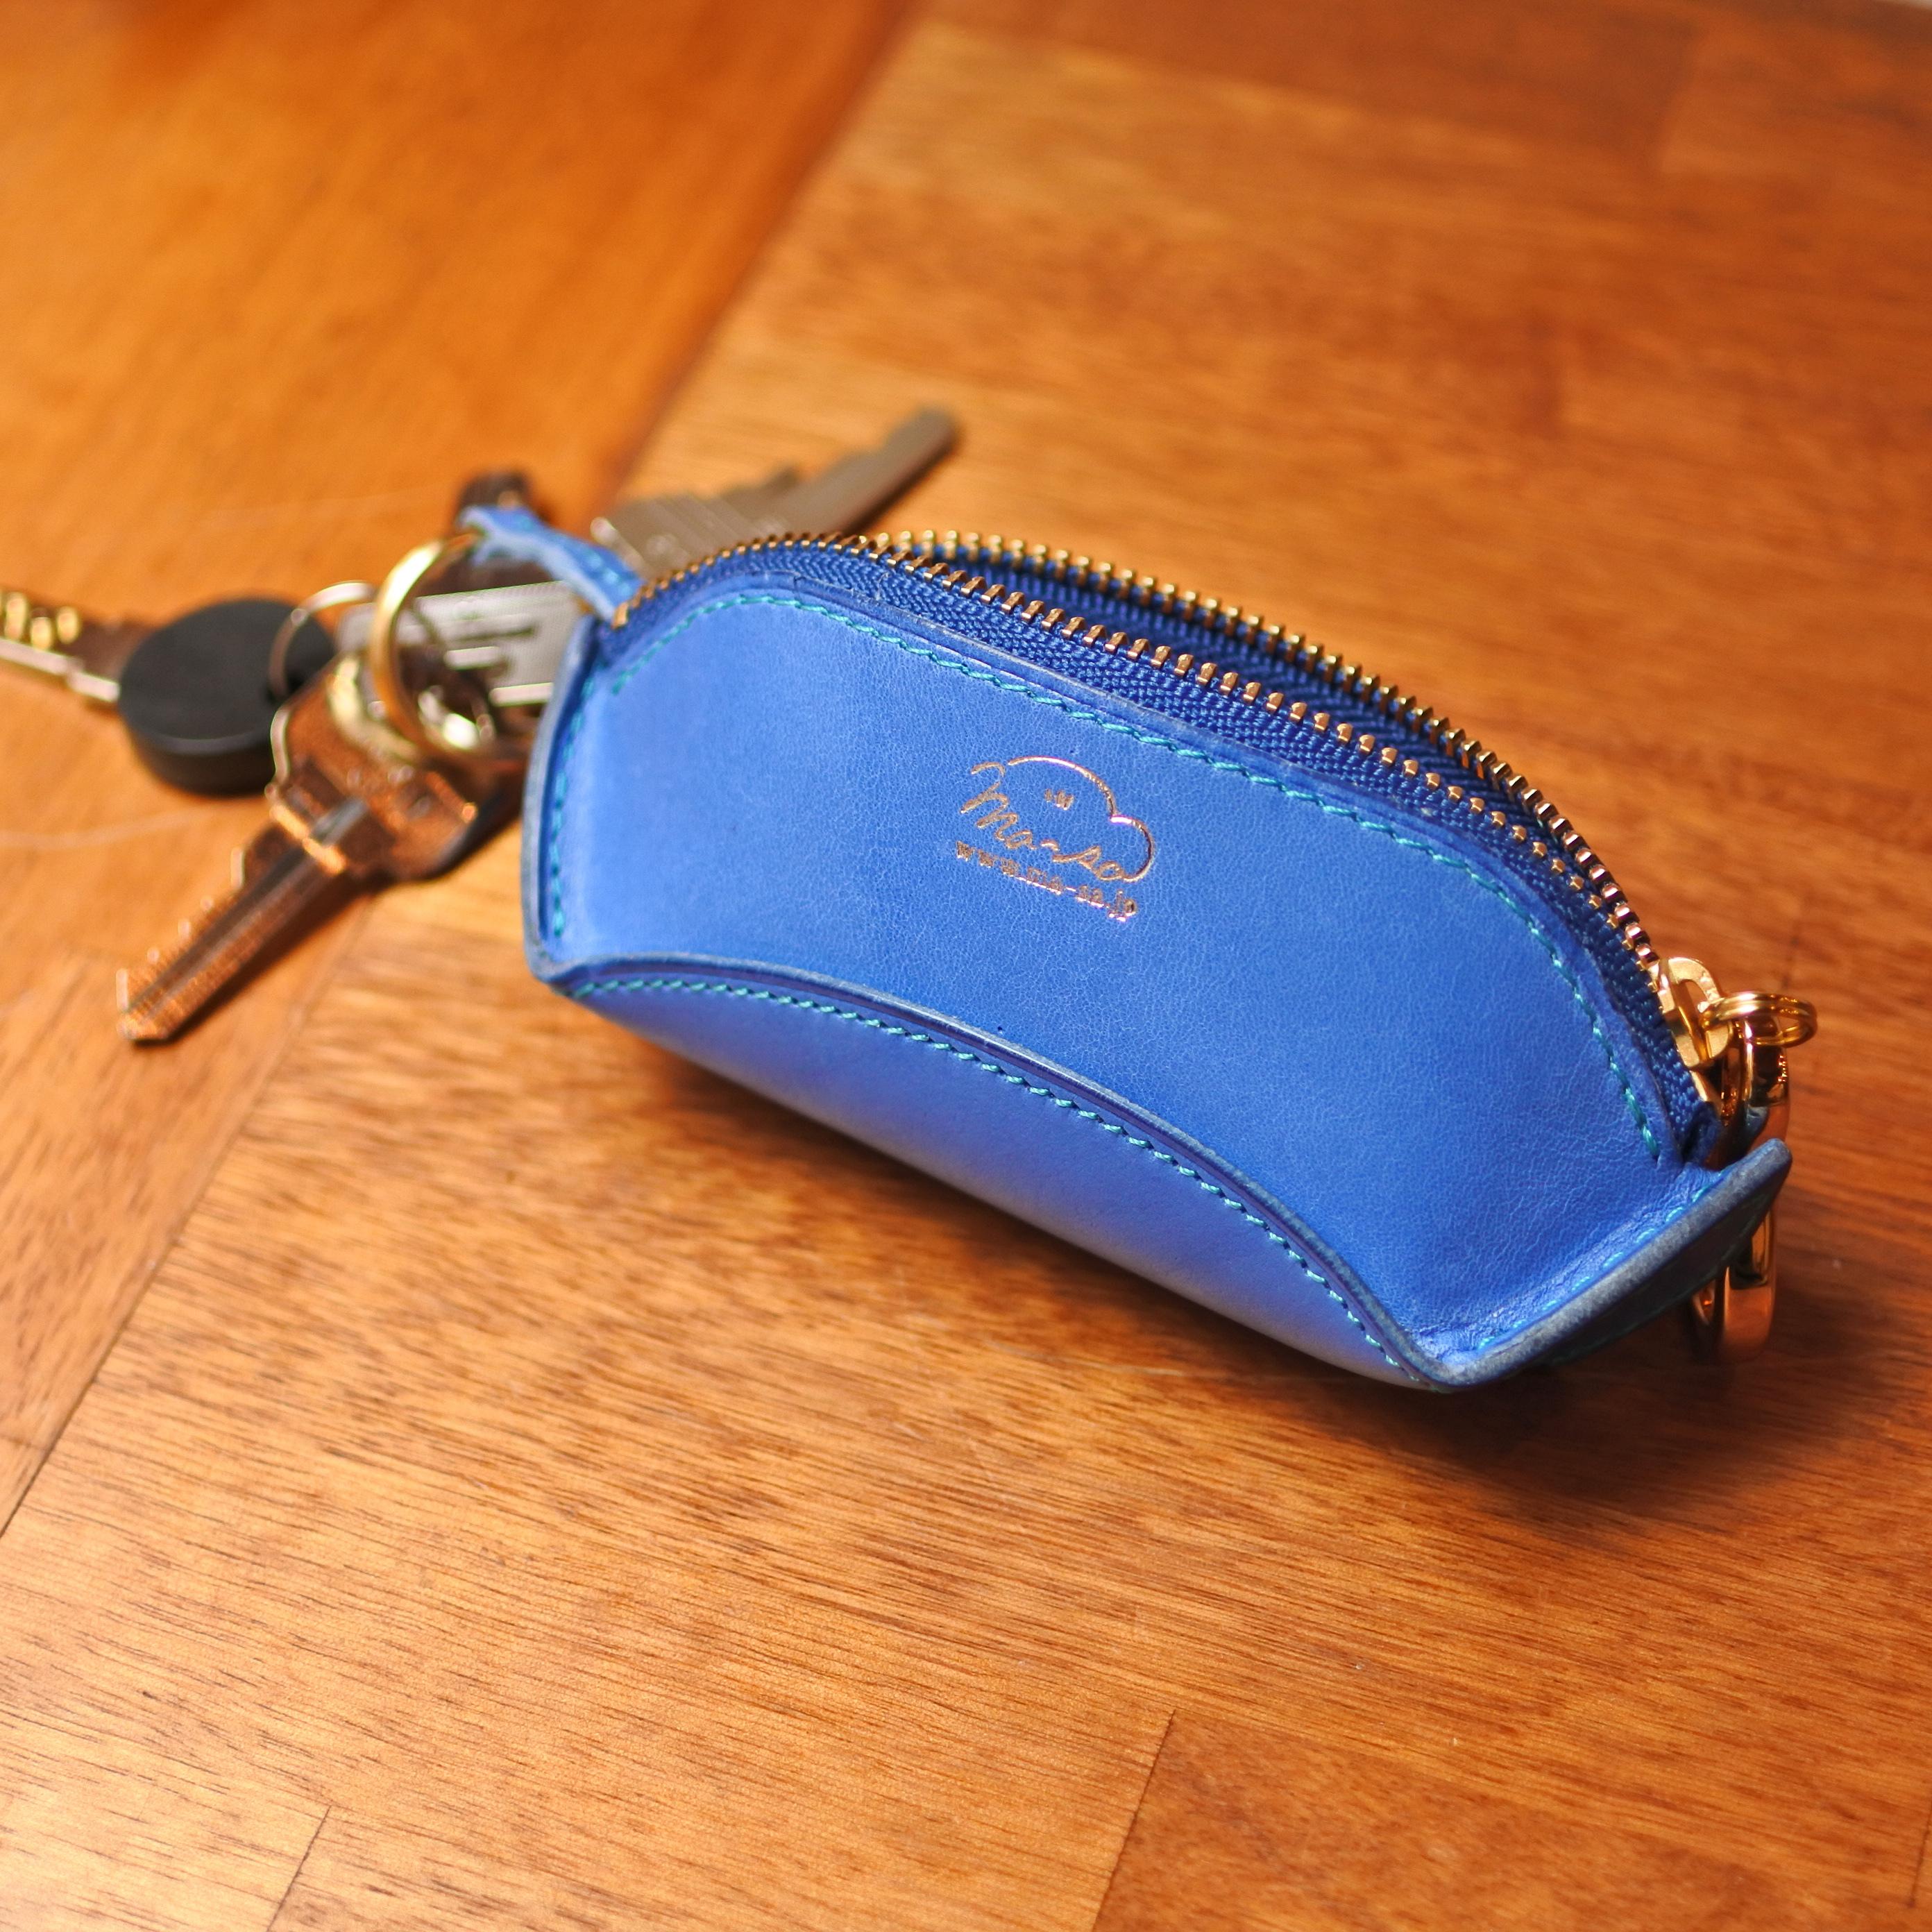 la culla  綺麗なブルーのキーケース&小銭入れ